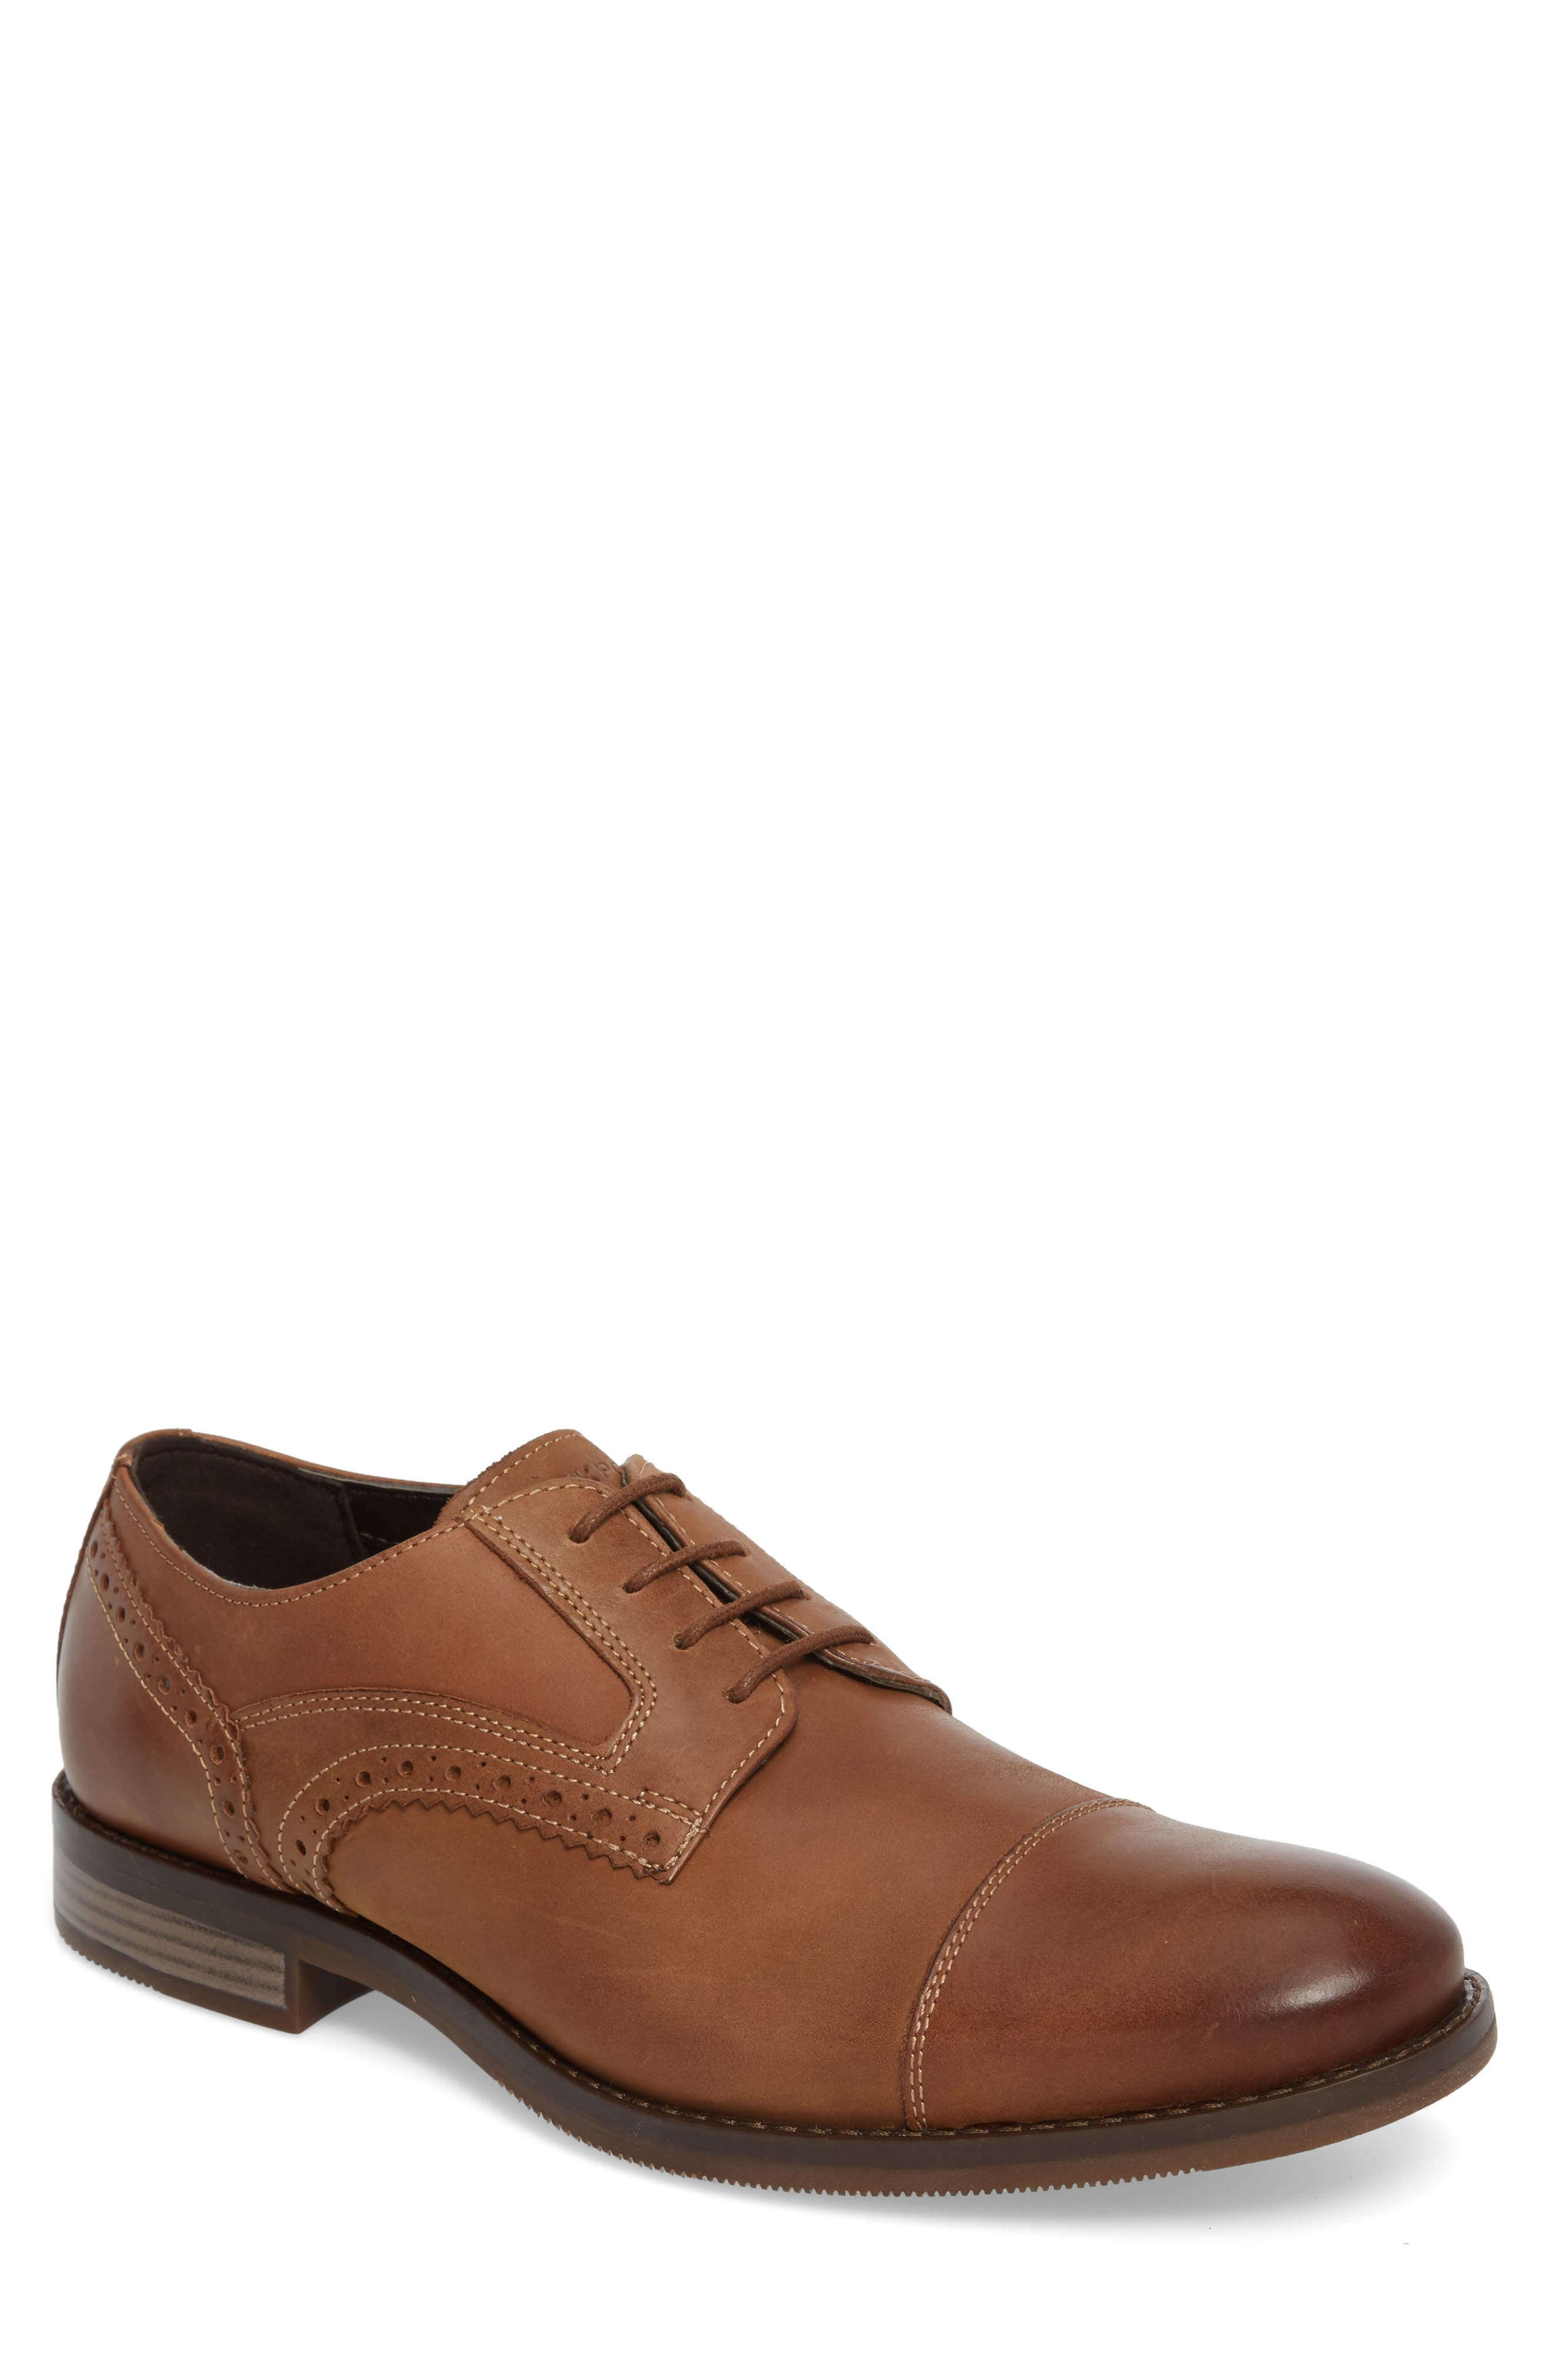 Wynston Cap Toe Blucher,                         Main,                         color, Tobacco Leather